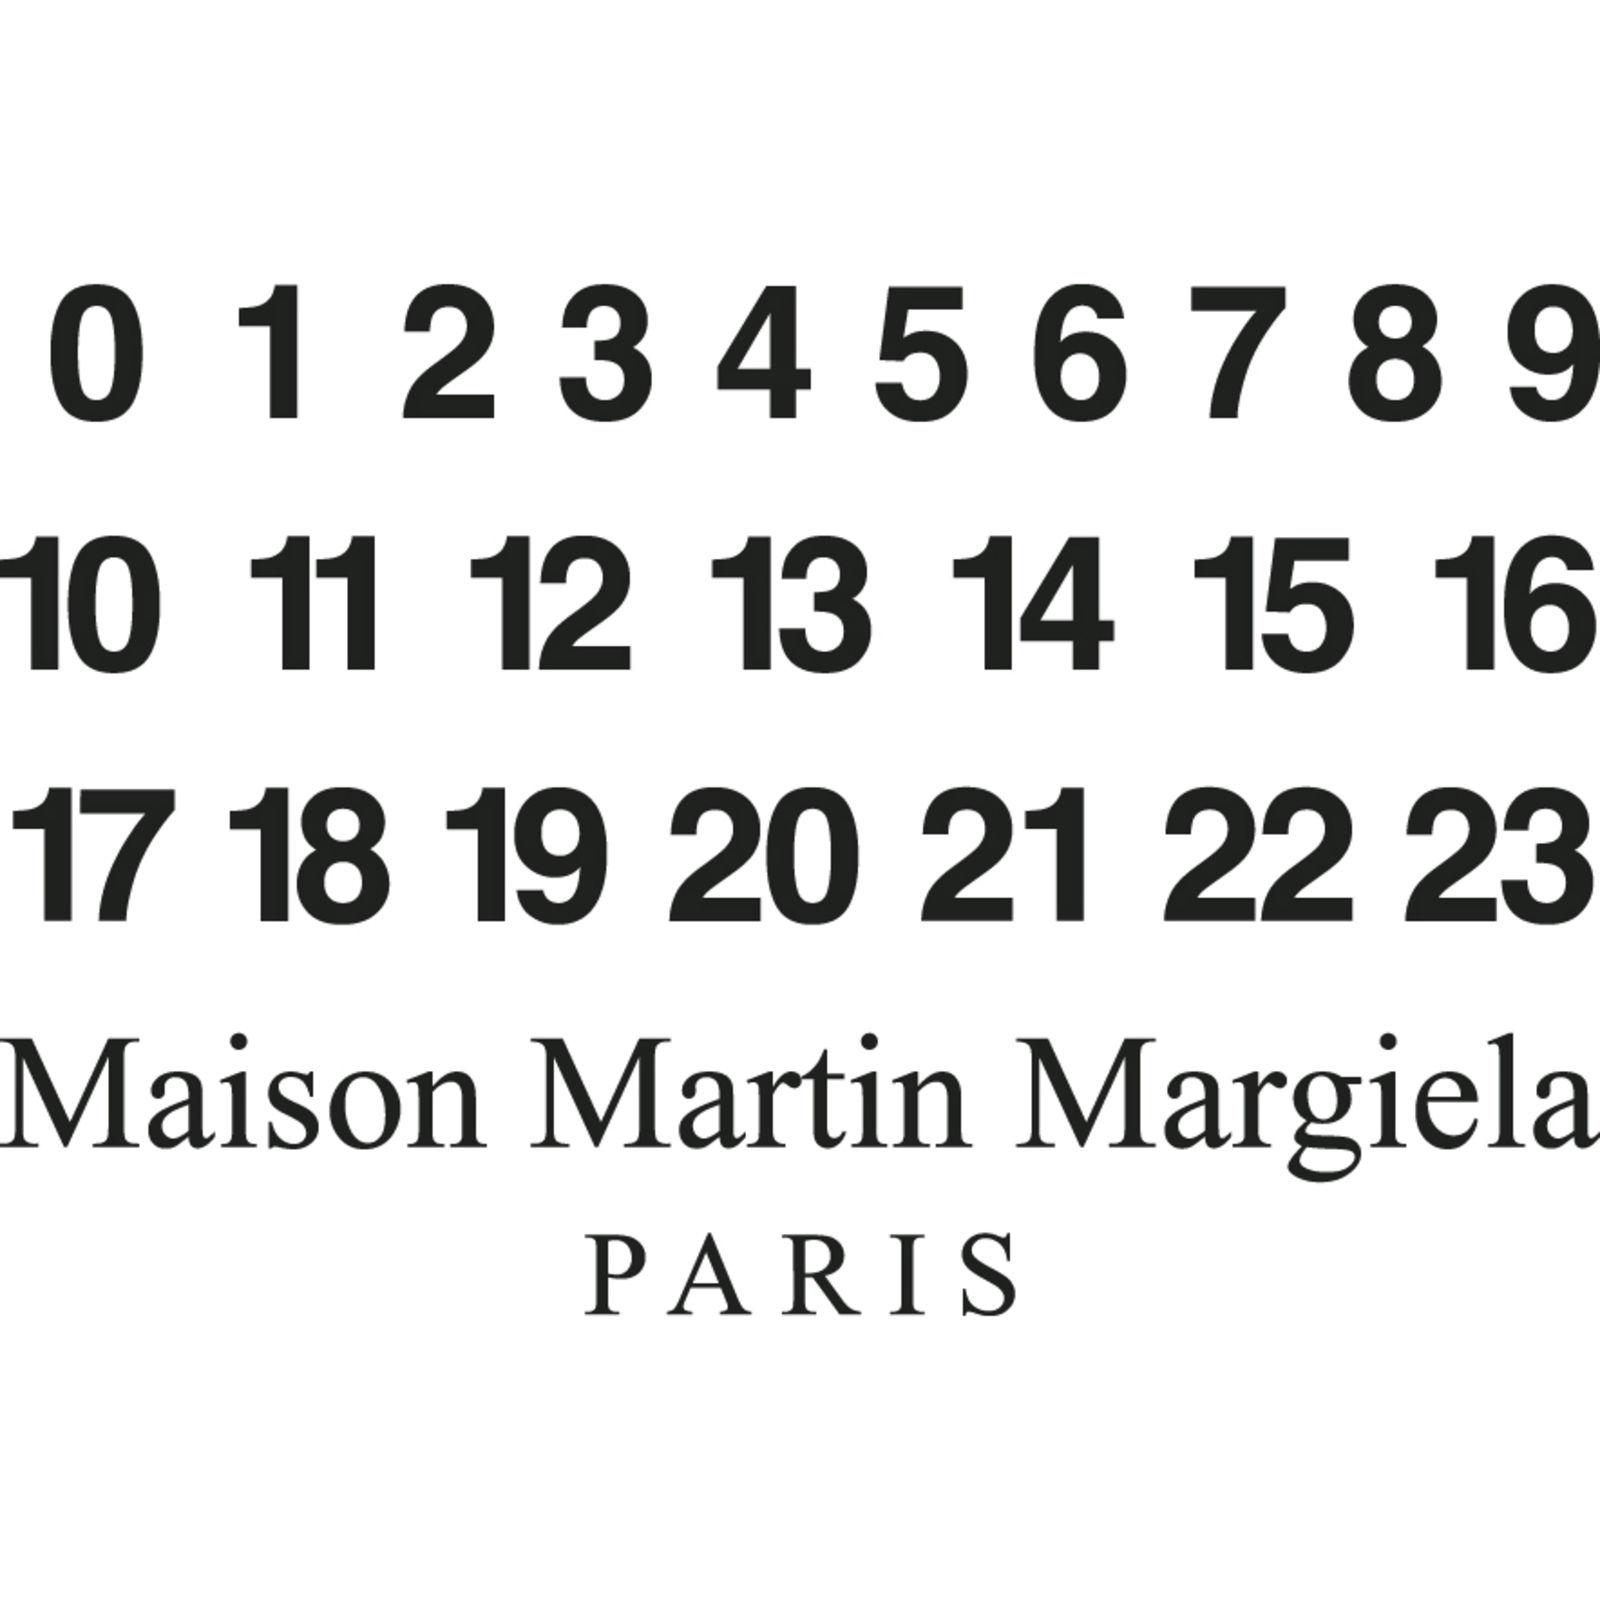 Maison Margiela Parfums (Bild 1)